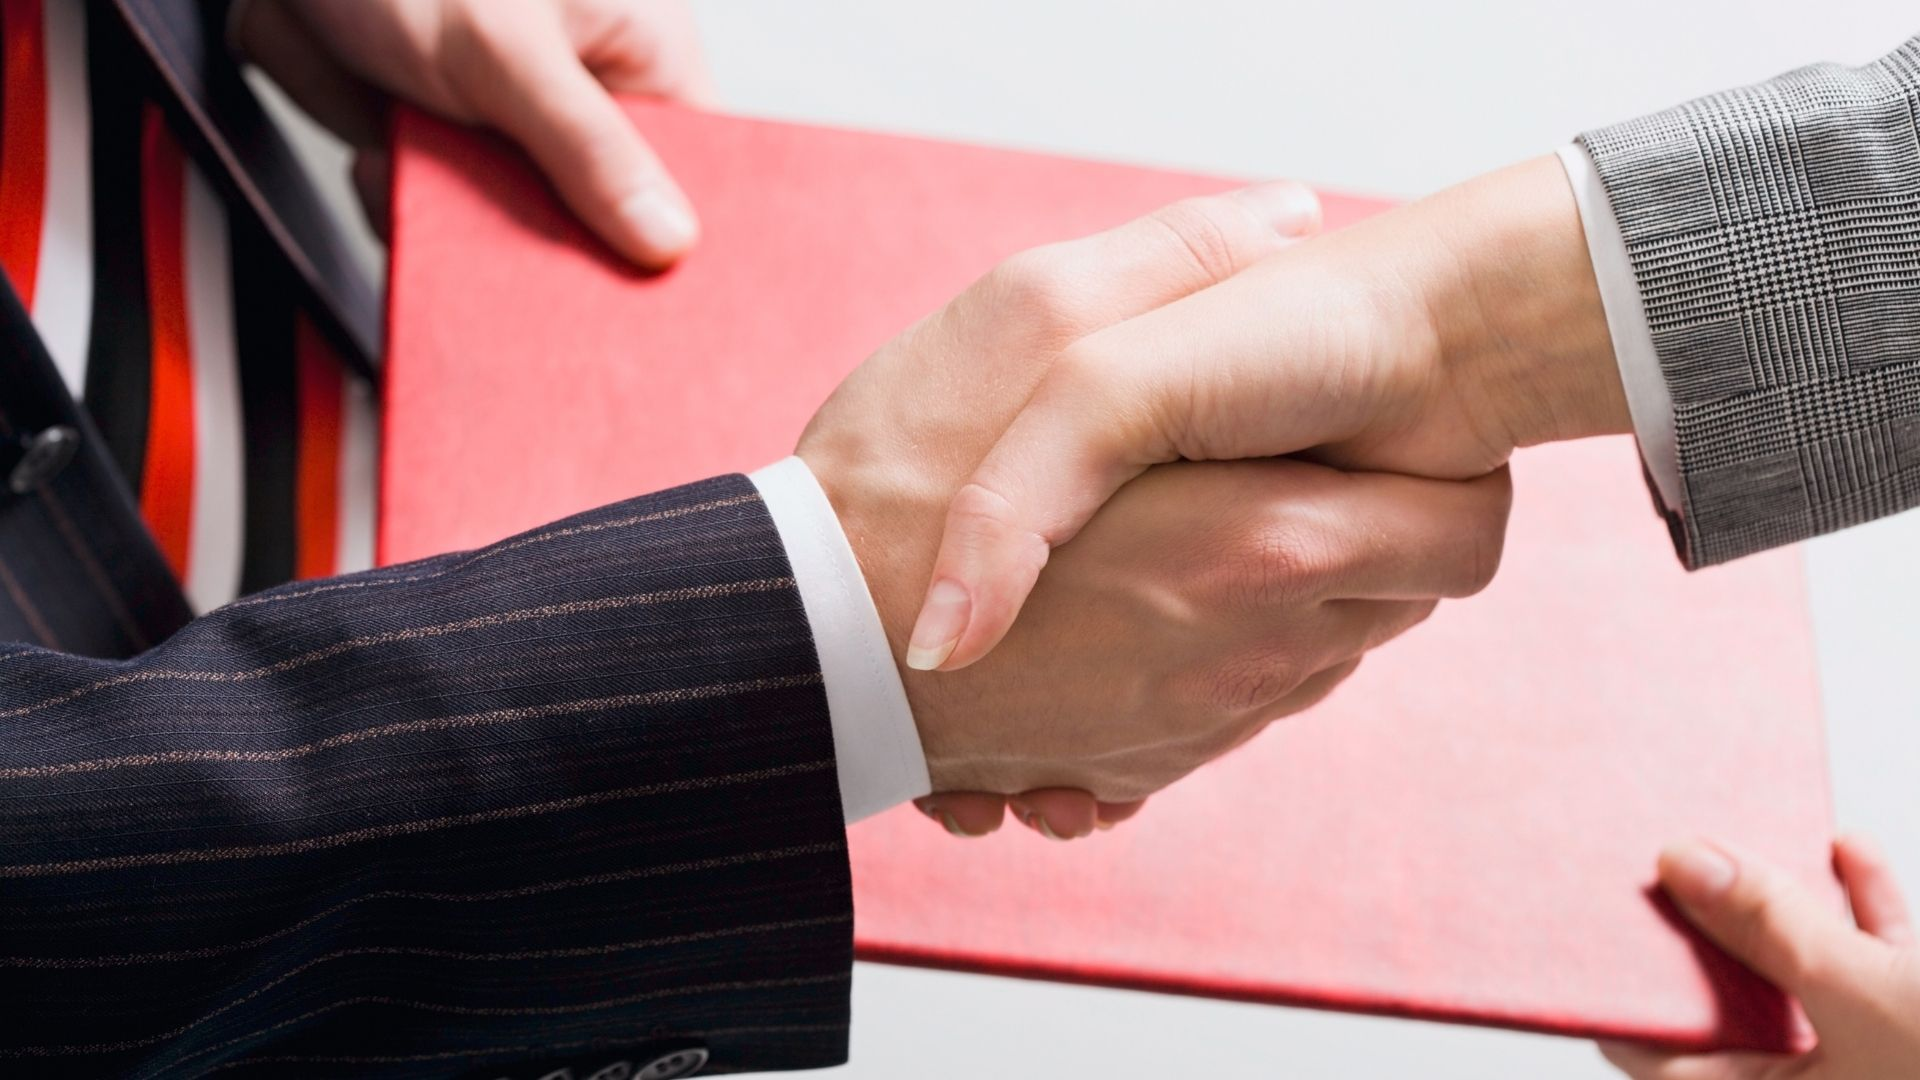 como-conquistar-novos-clientes-para-seu-negocio